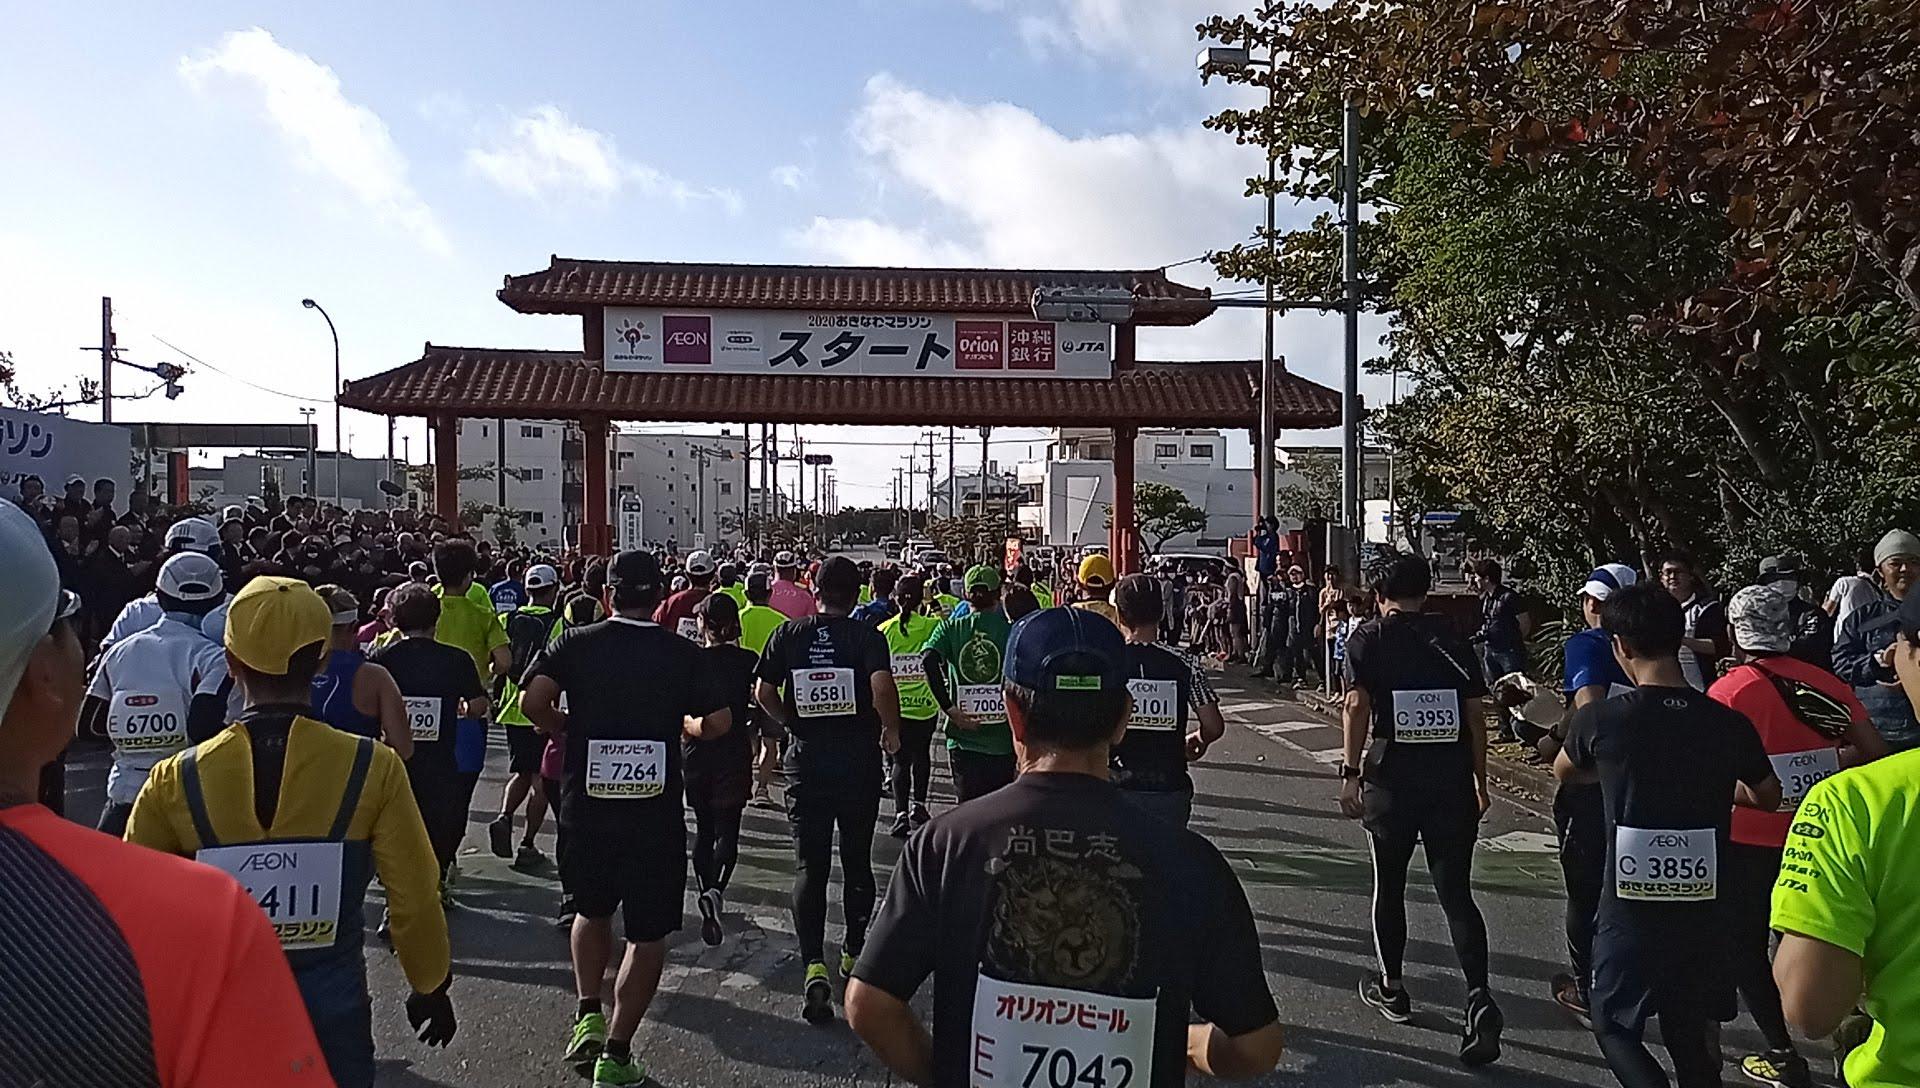 Let's start the Okinawa Marathon